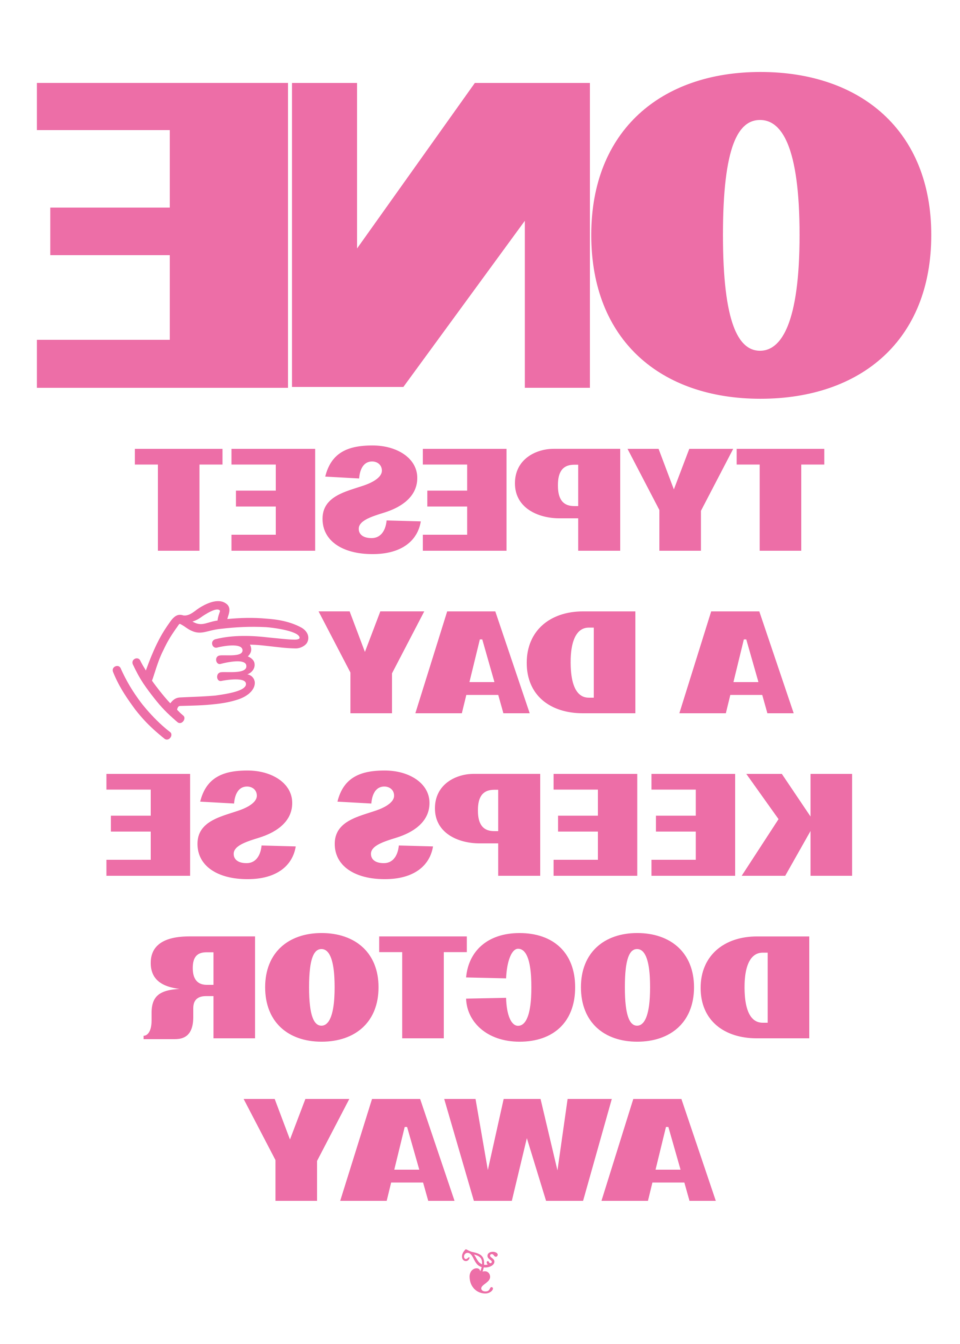 Karsten Rohrbeck: One Typeset a day Poster